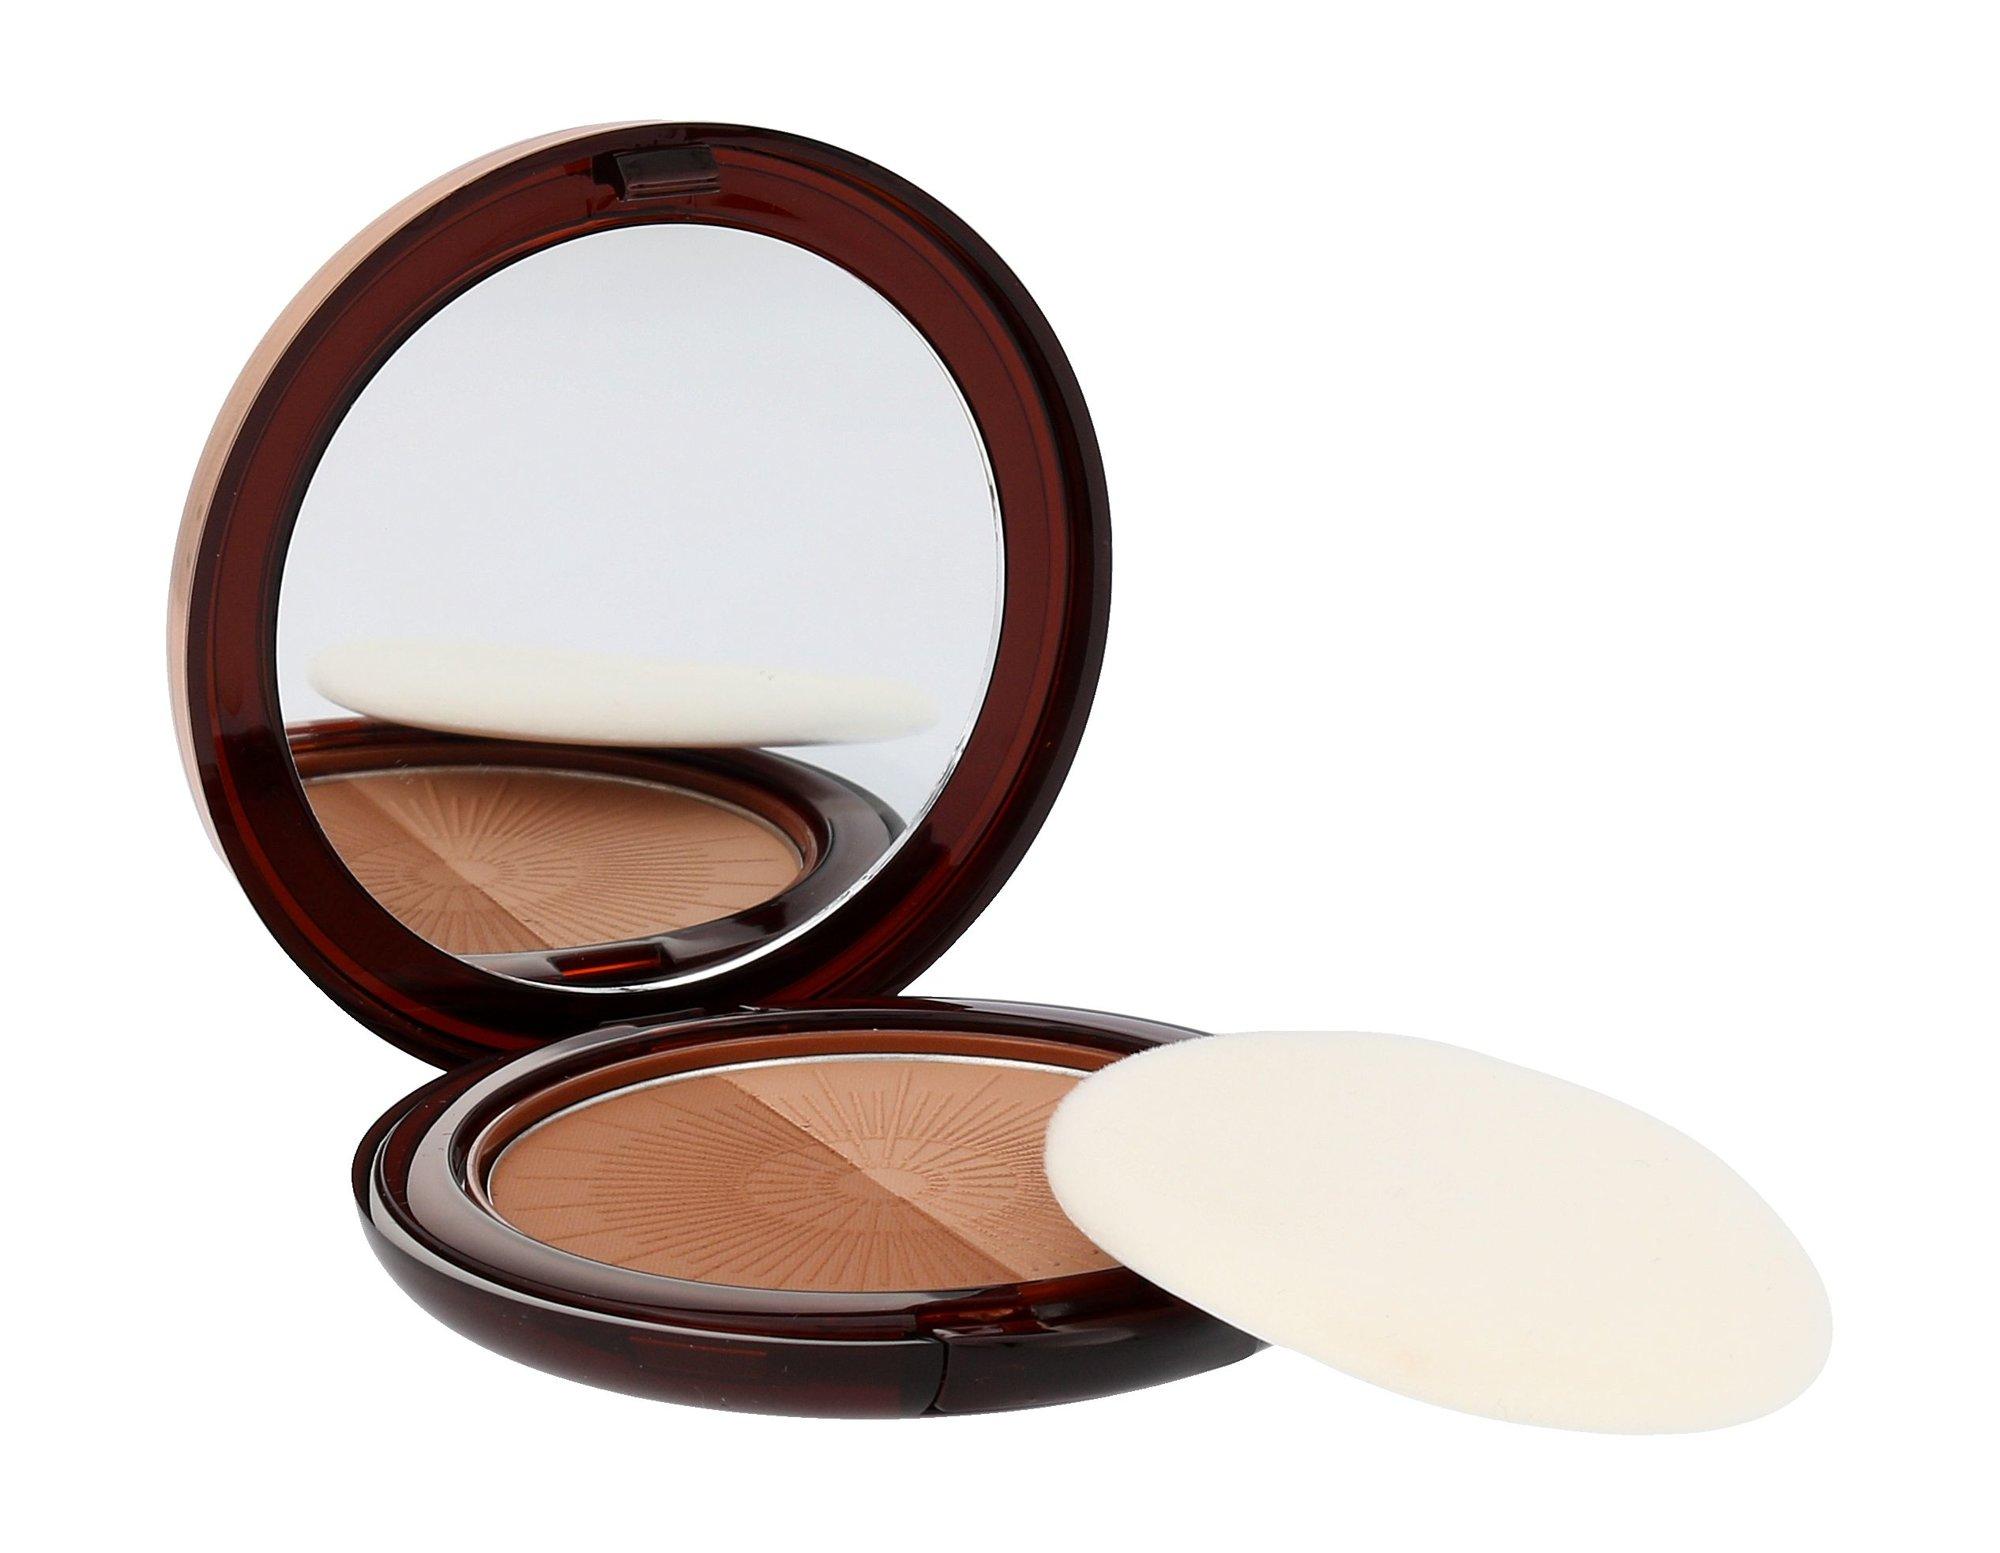 Artdeco Bronzing Powder Compact Bronzer 10ml 50 Almond